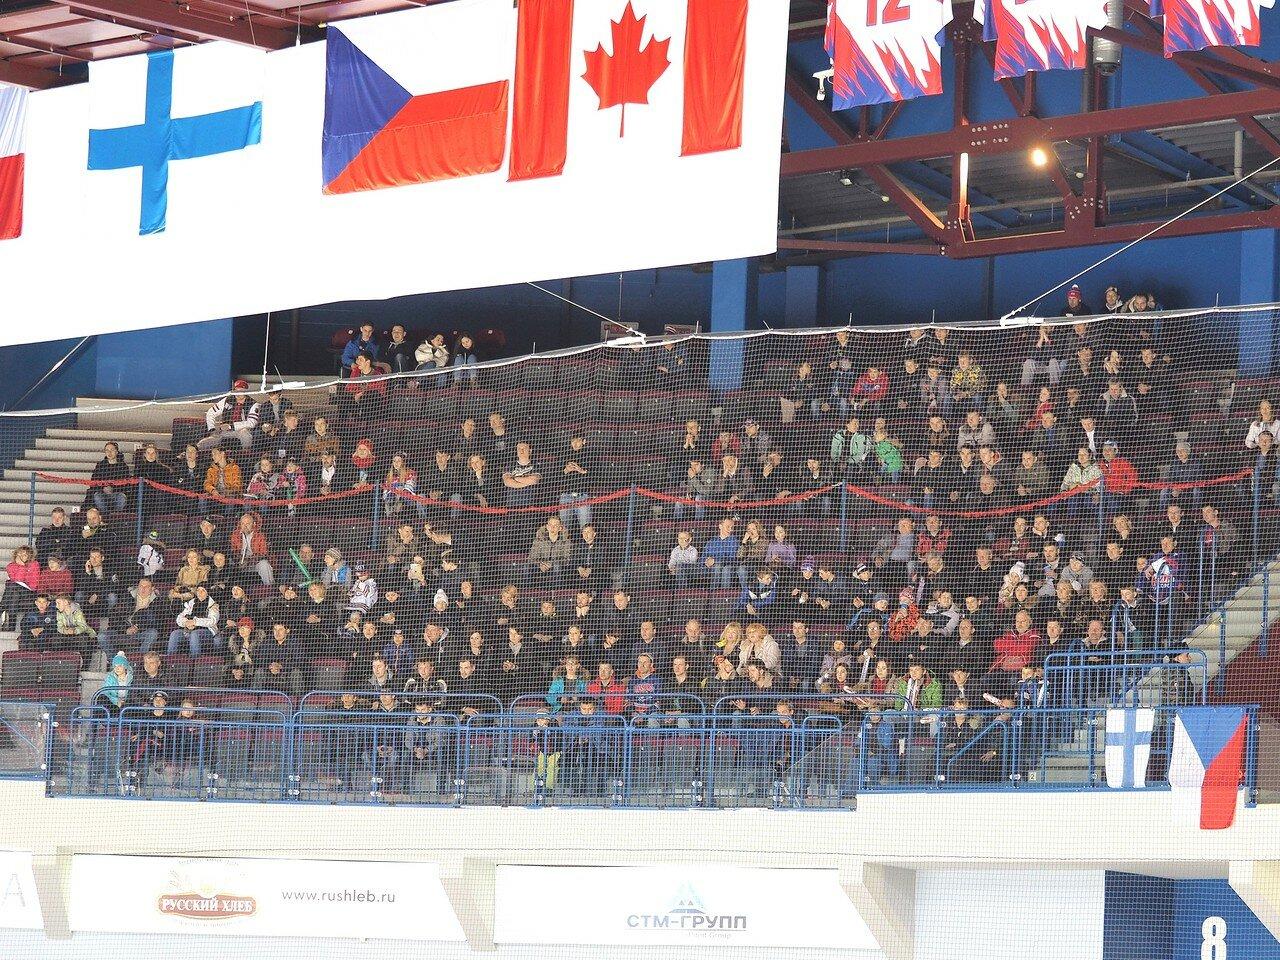 71Плей-офф 2016 Восток 1/2 Металлург - Сибирь 16.03.2016